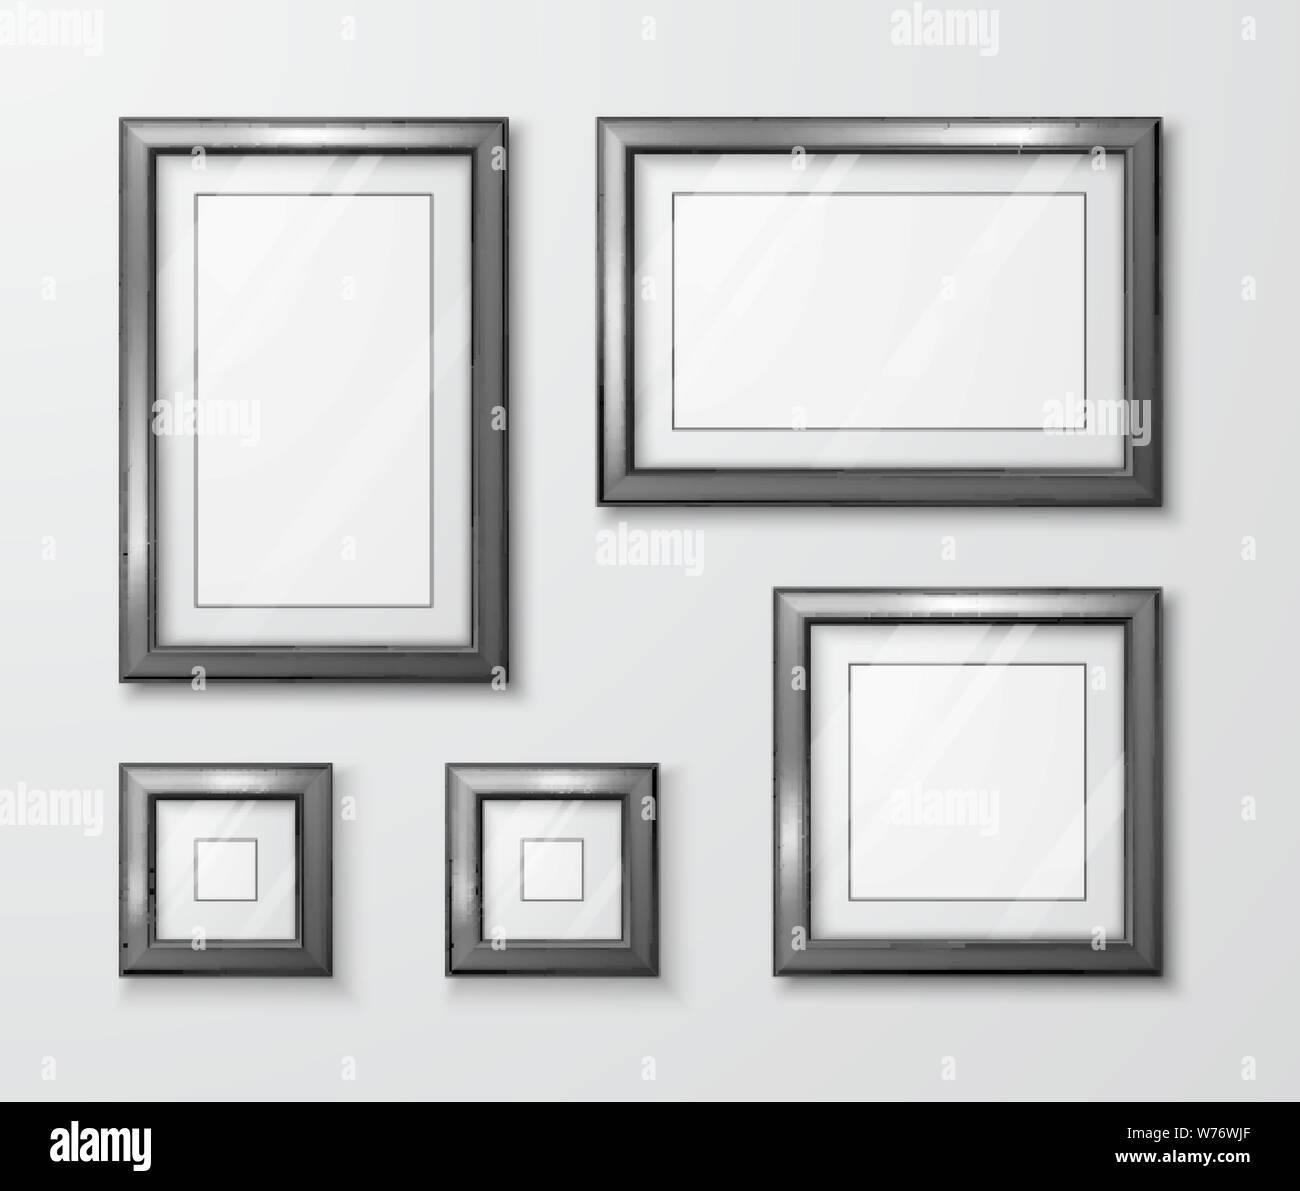 Ynas Design Blog Paperframes Diy Bilderrahmen Aus Papier 5